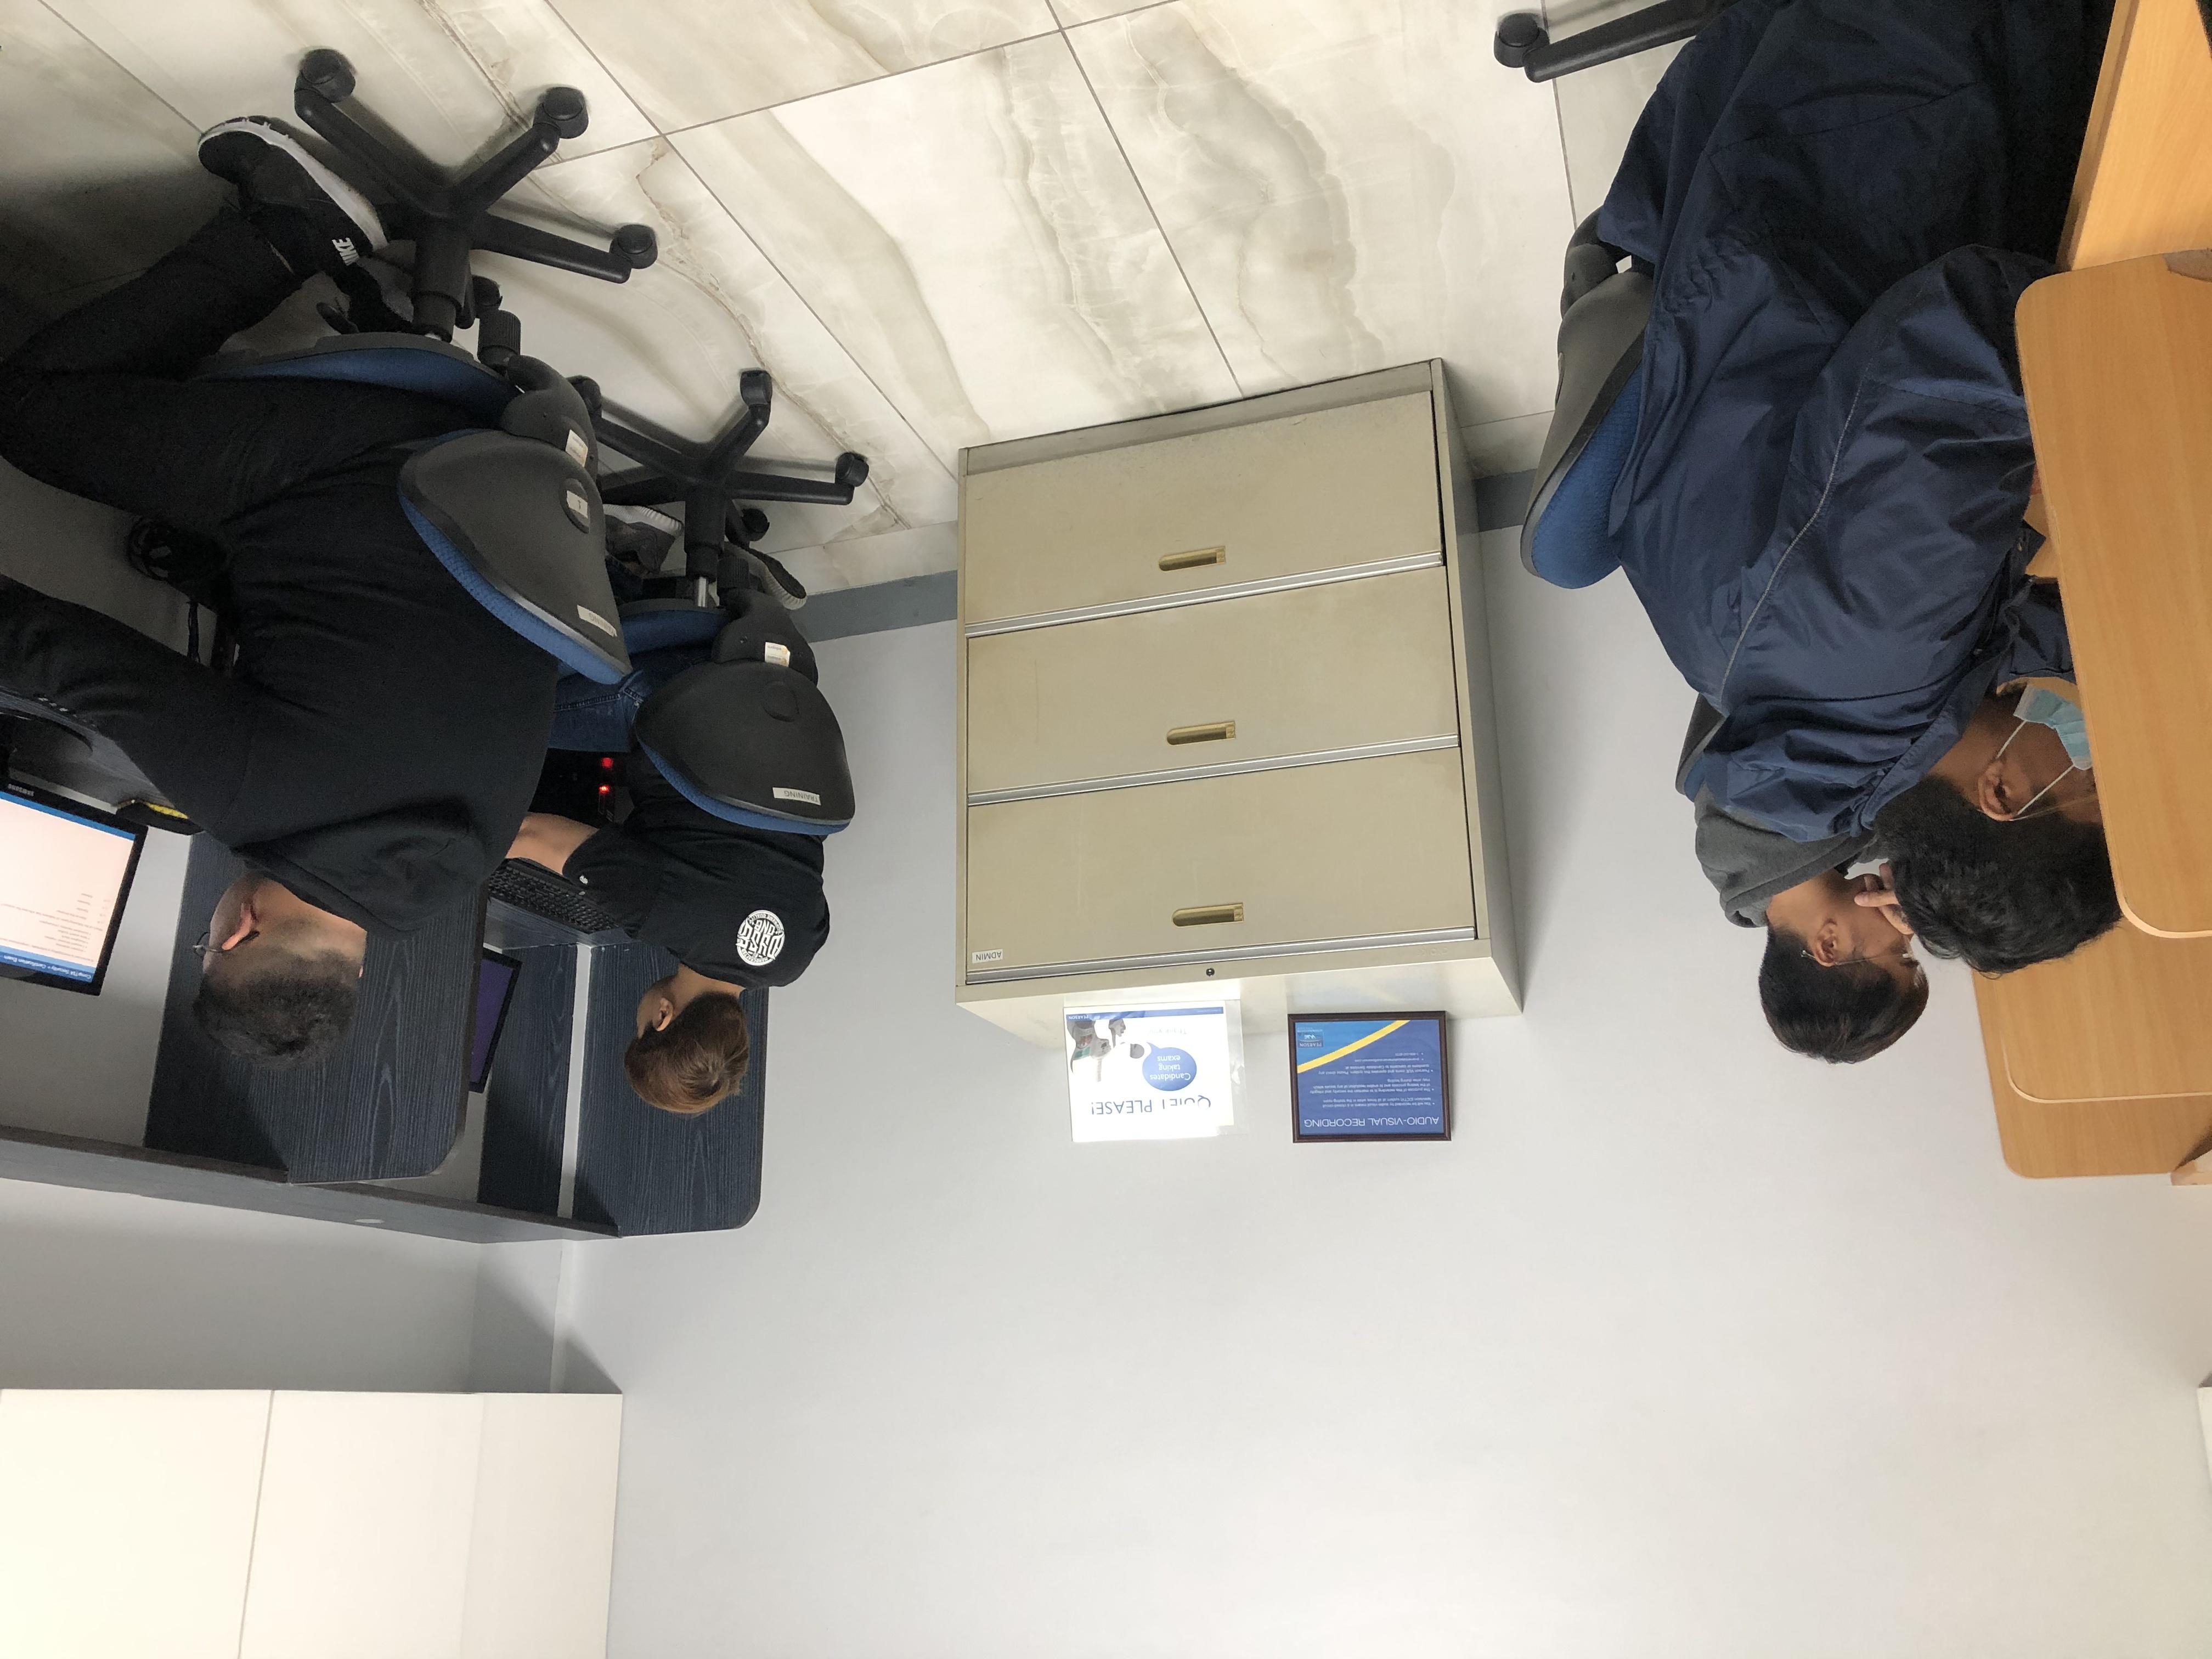 Certification room